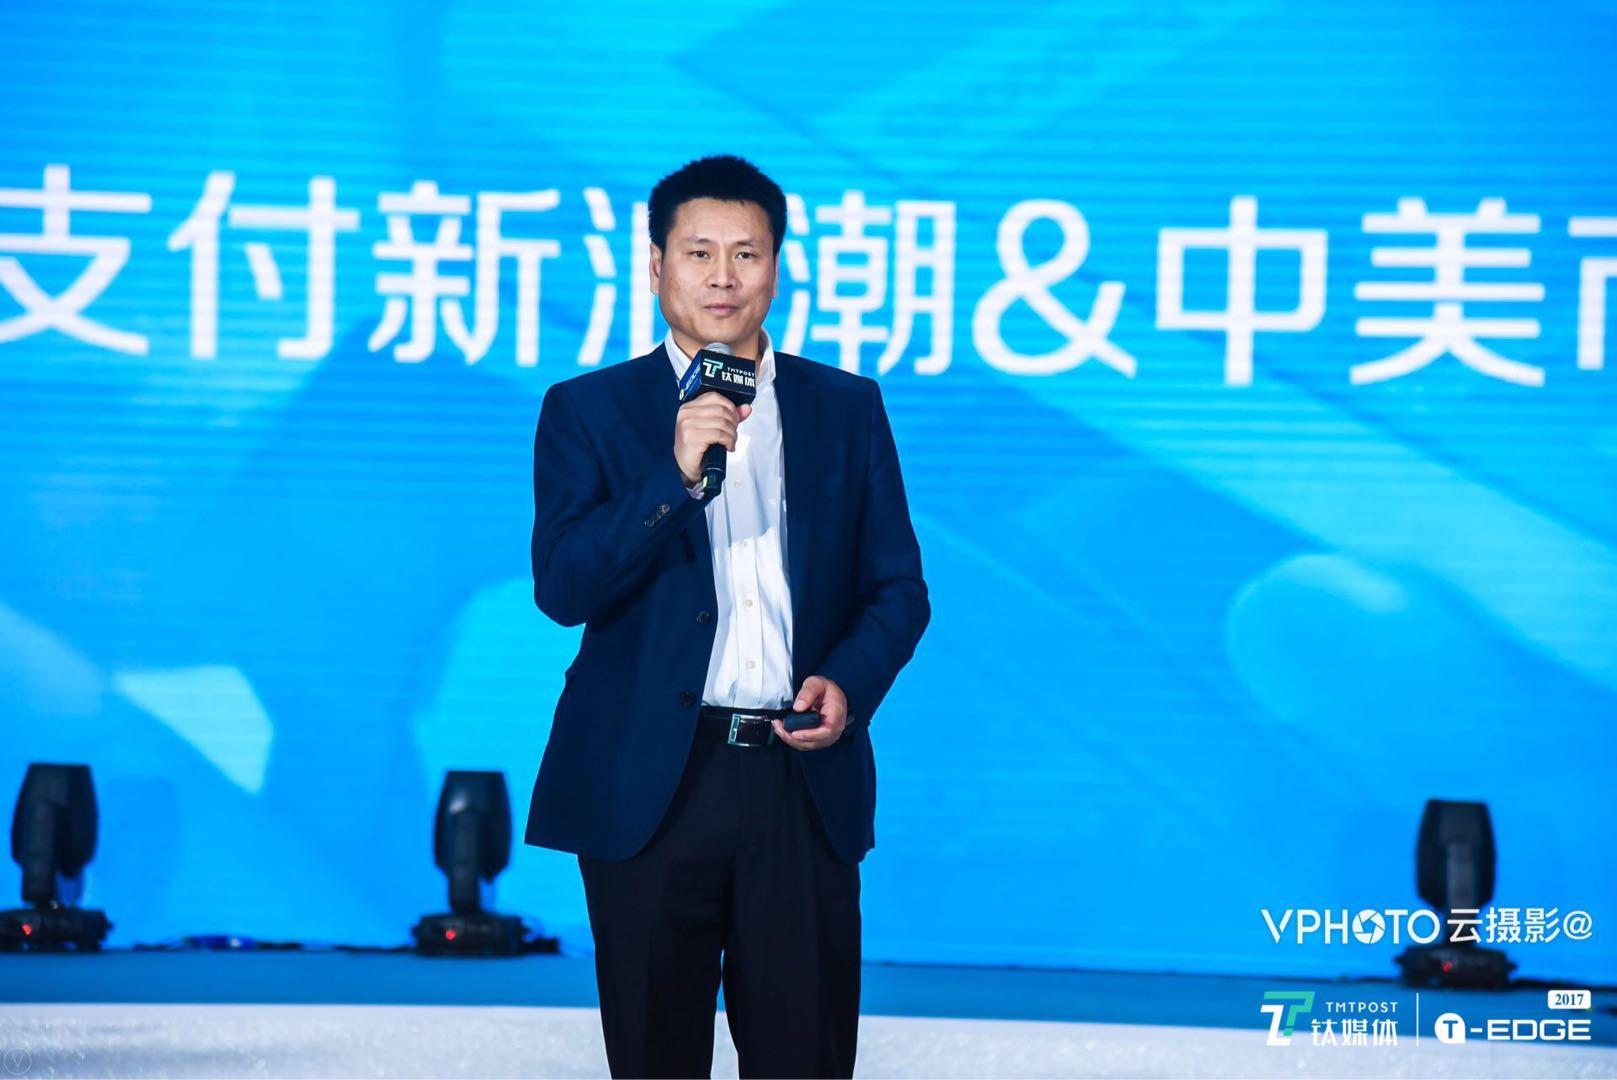 Citcon CEO 黄春波:移动支付领域,中美的差距为何这么大?